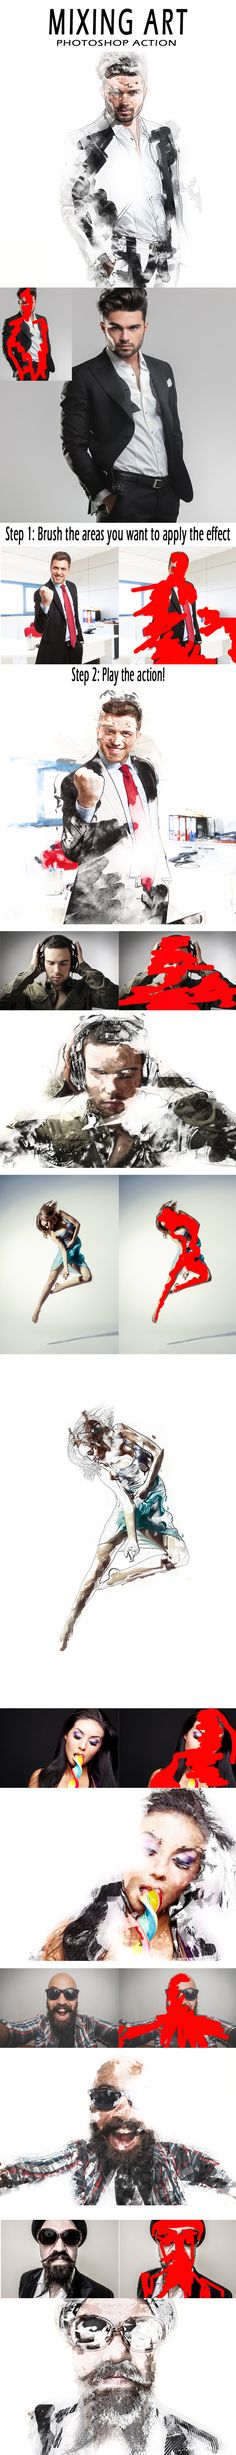 Mixing Art Photoshop Action #photoeffect Download: http://graphicriver.net/item/mixing-art-photoshop-action/13618074?ref=ksioks